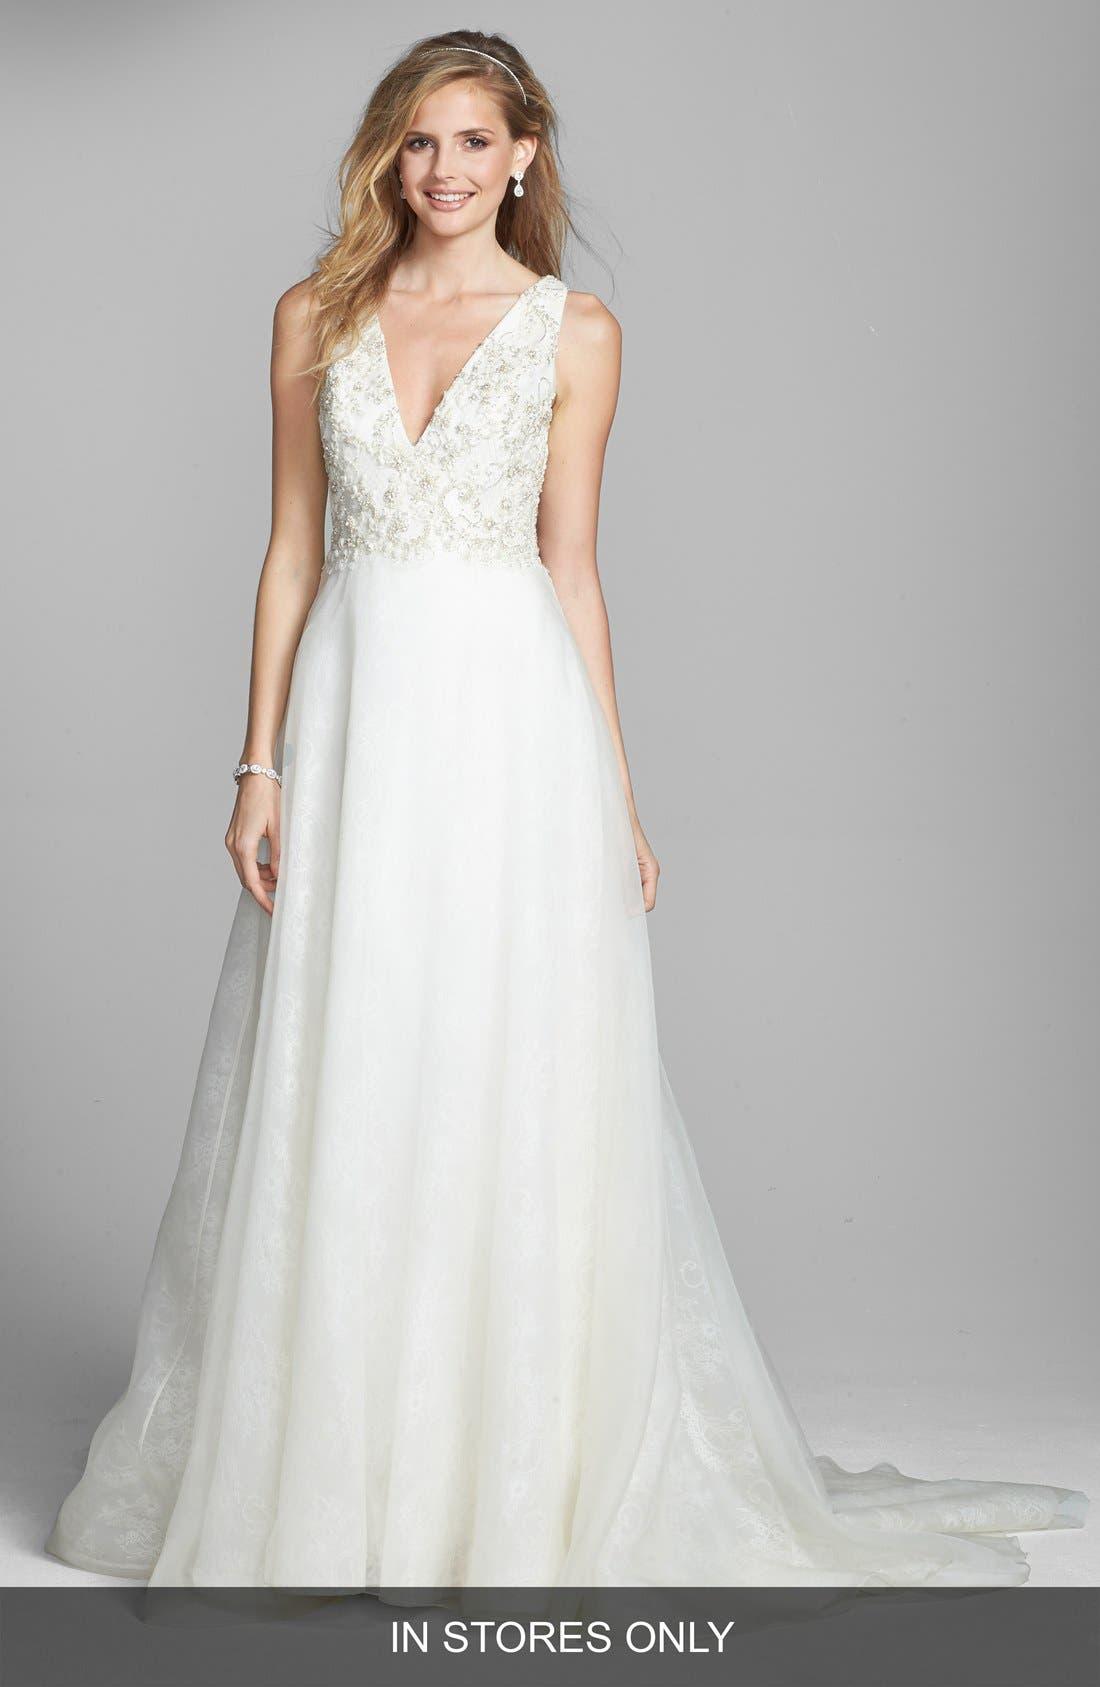 Main Image - Badgley Mischka Bridal 'Lana' Embellished Silk Organza Dress (In Stores Only)